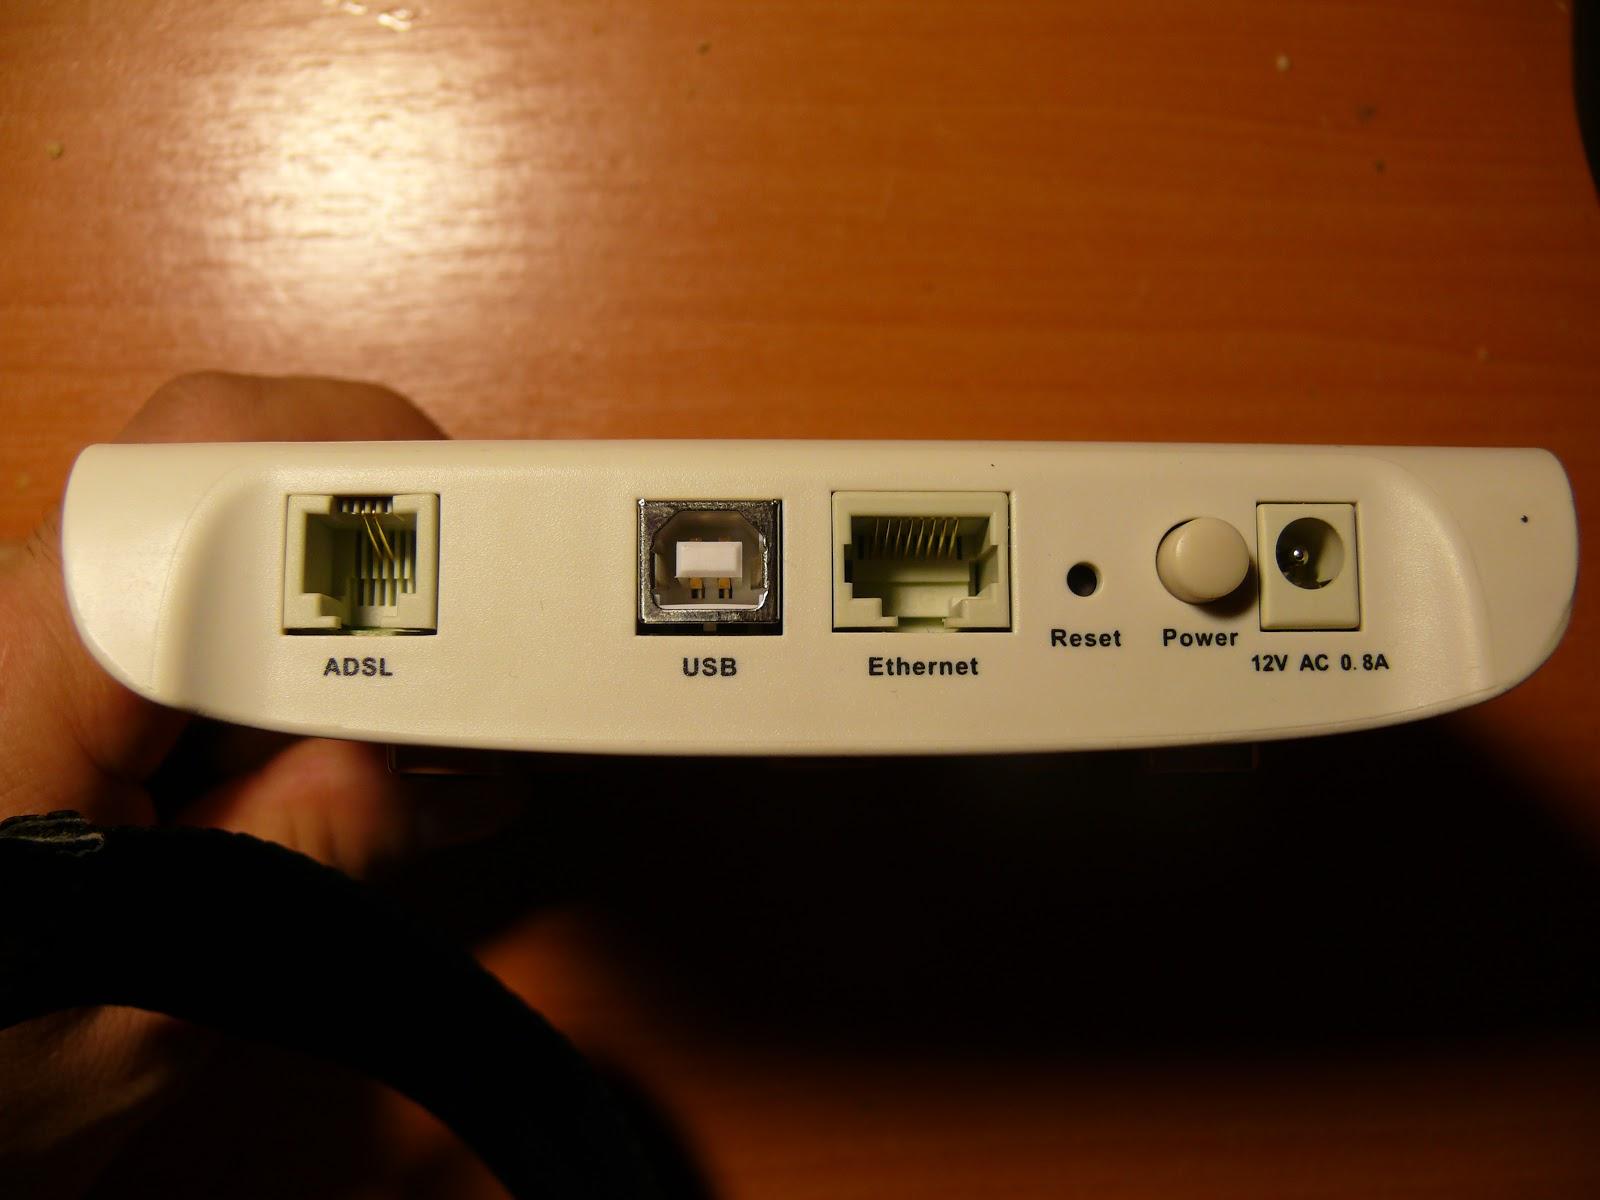 HUAWEI MT882 USB DRIVER FOR WINDOWS XP